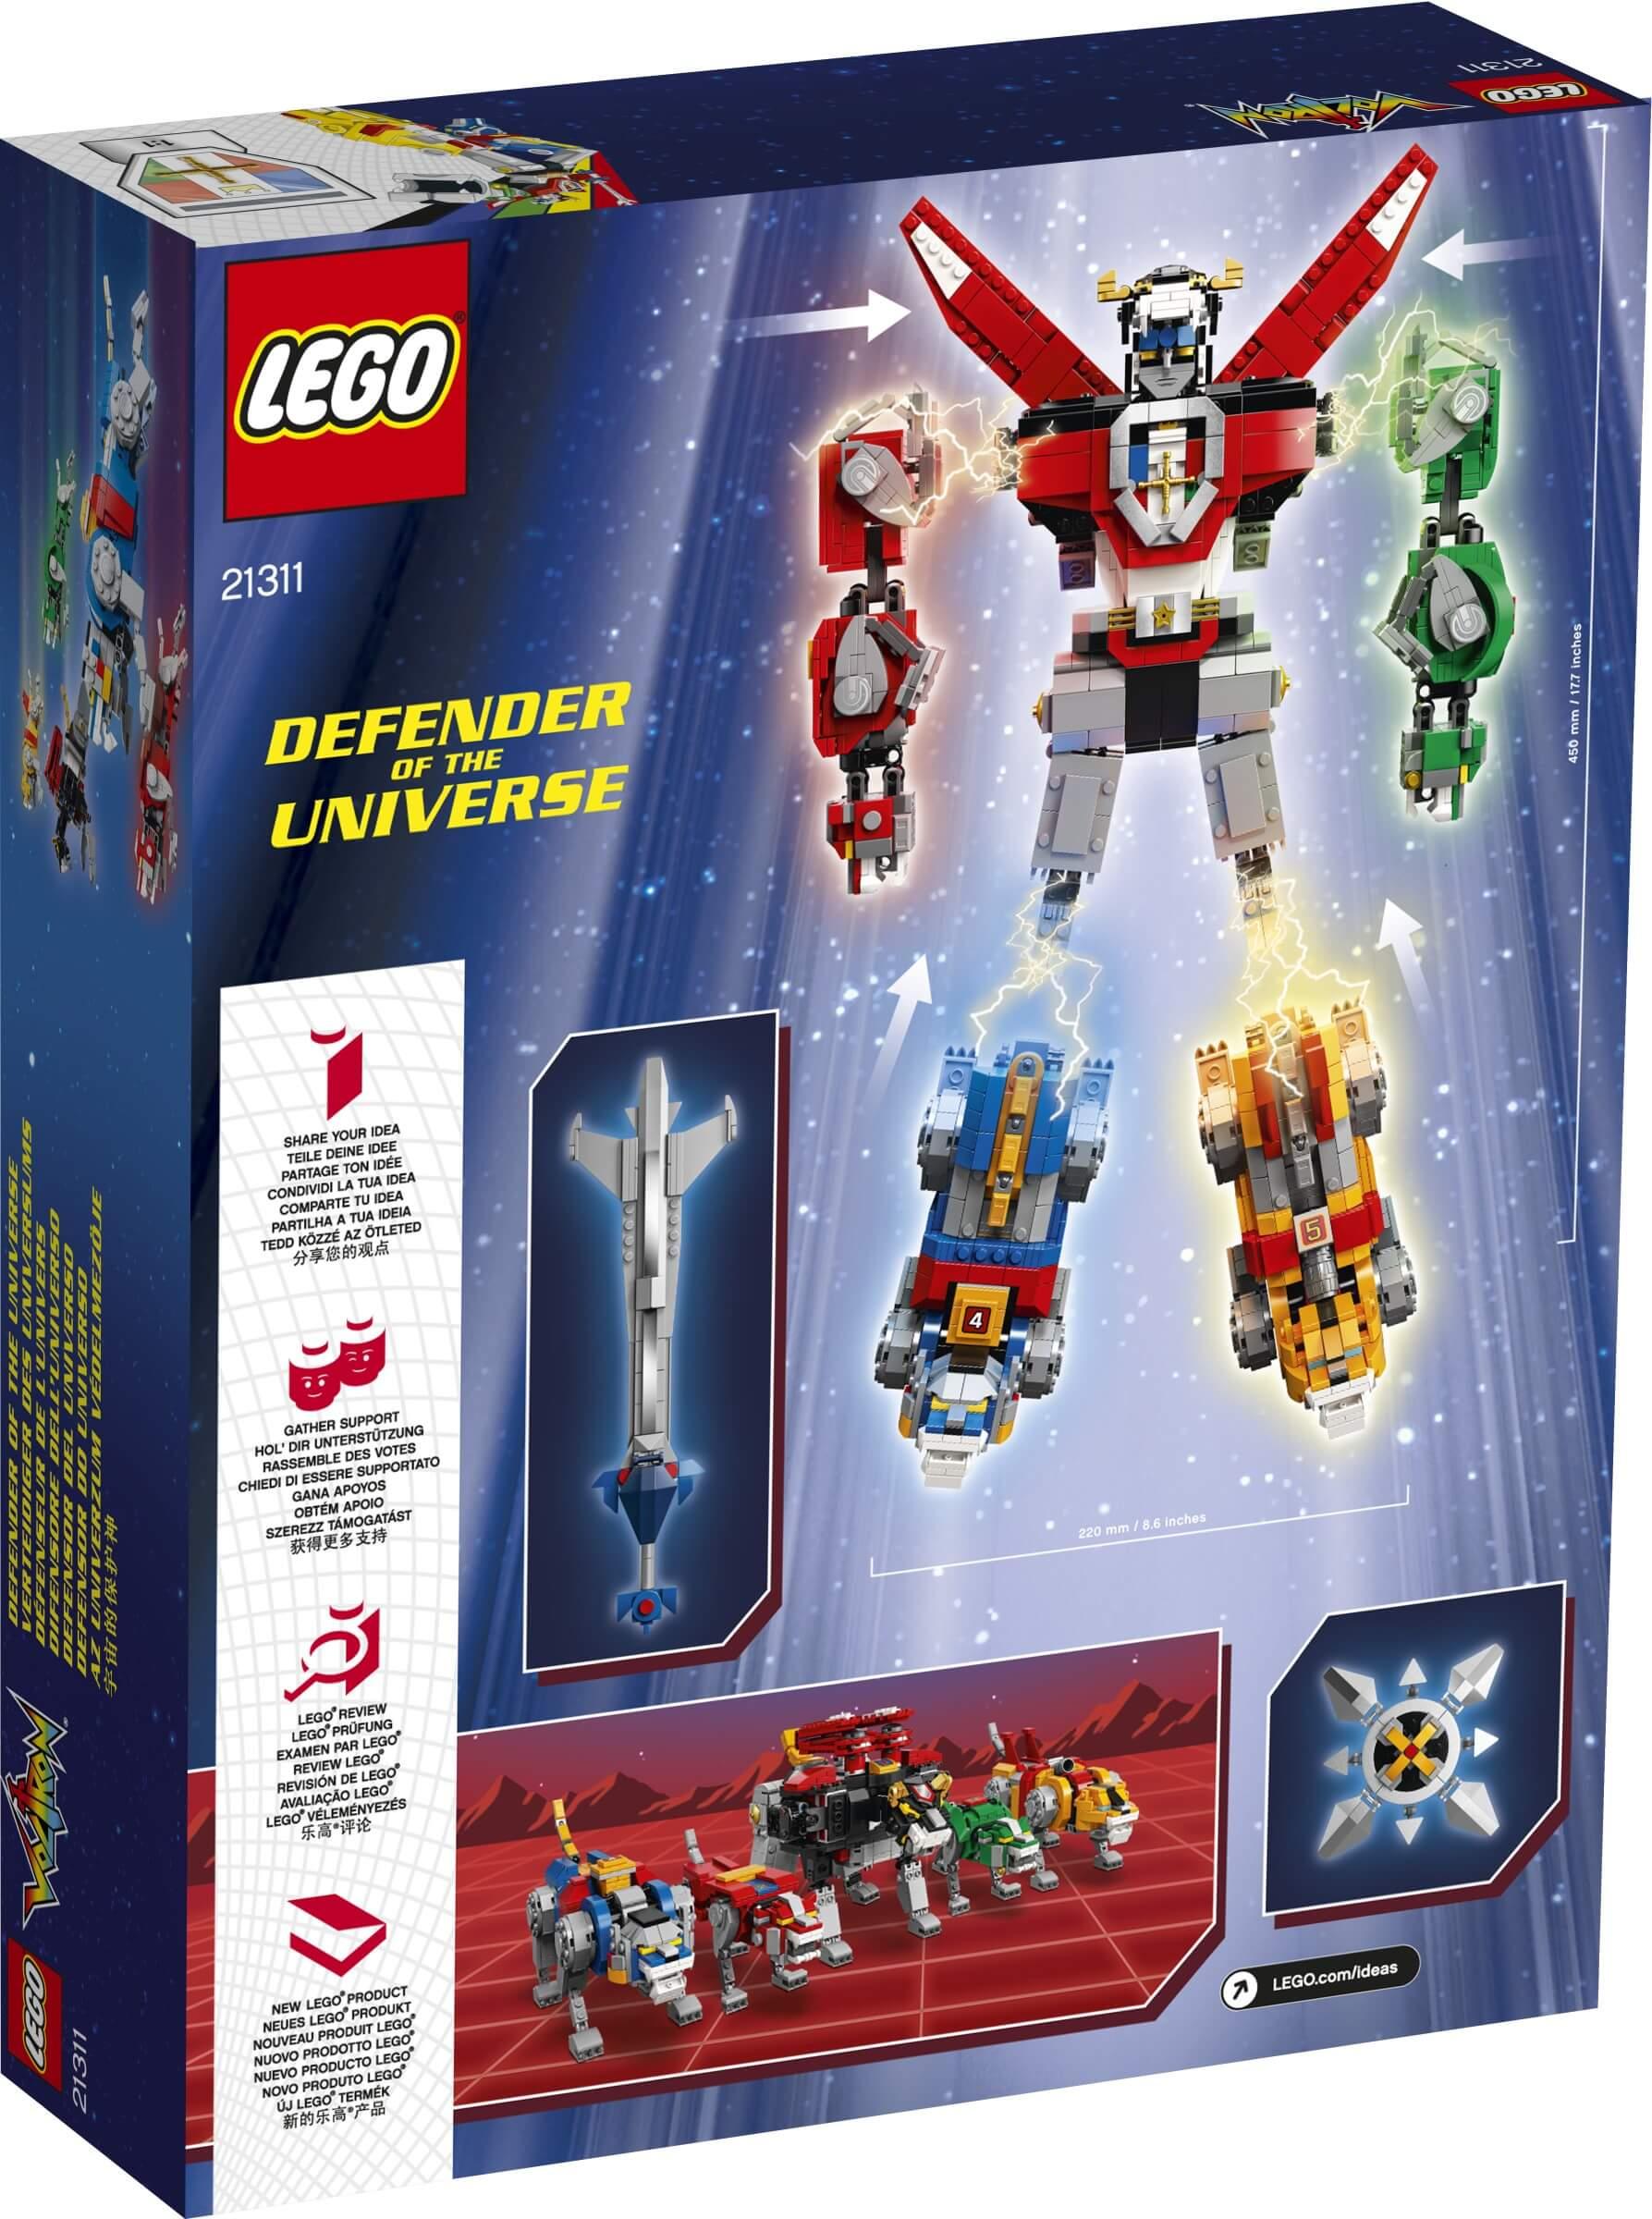 Mua đồ chơi LEGO 21311 - LEGO Ideas 21311 - Người Máy Voltron Biến Hình (LEGO Ideas 21311 Voltron)